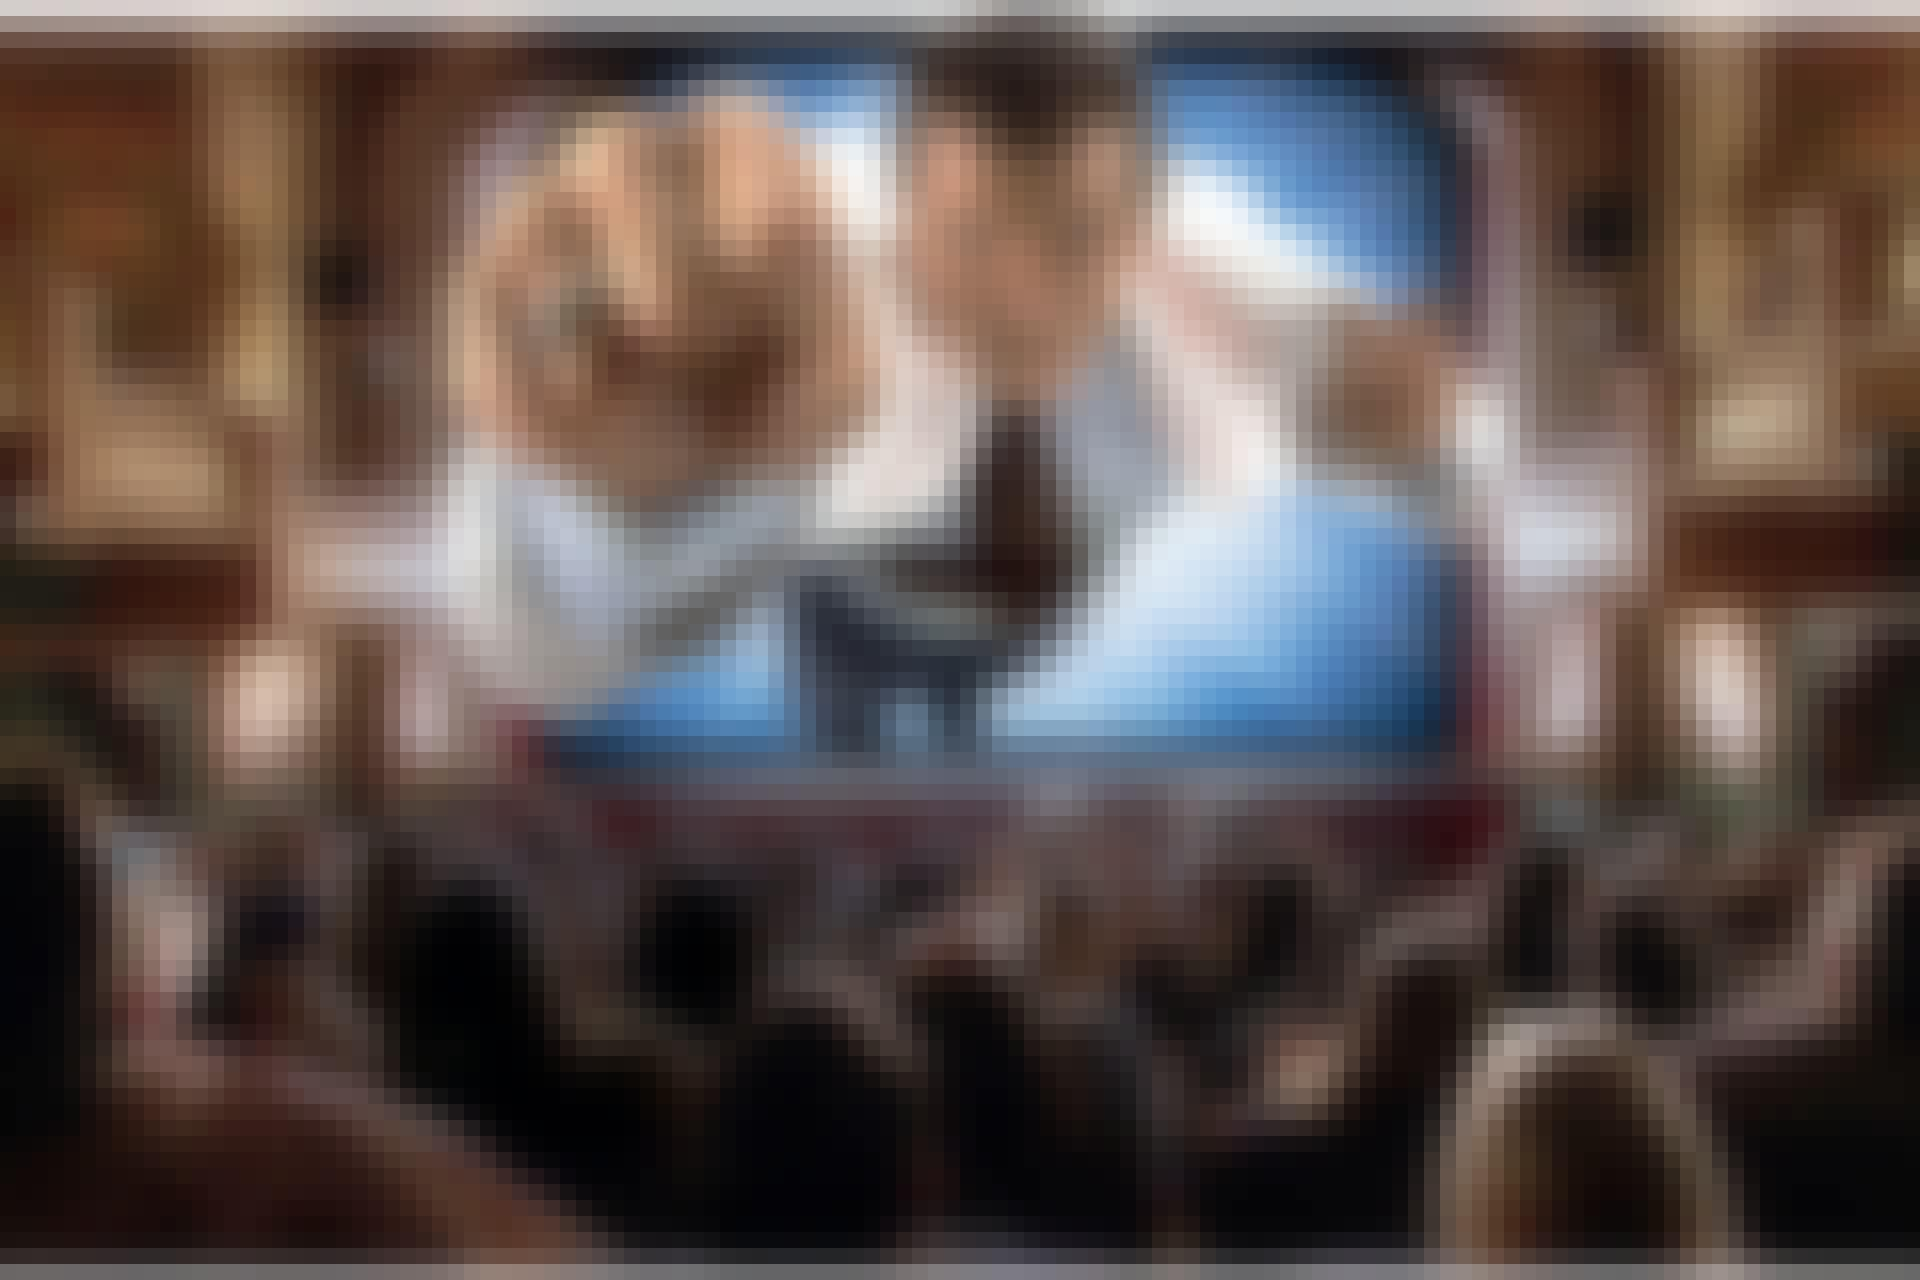 3-D Movie collage